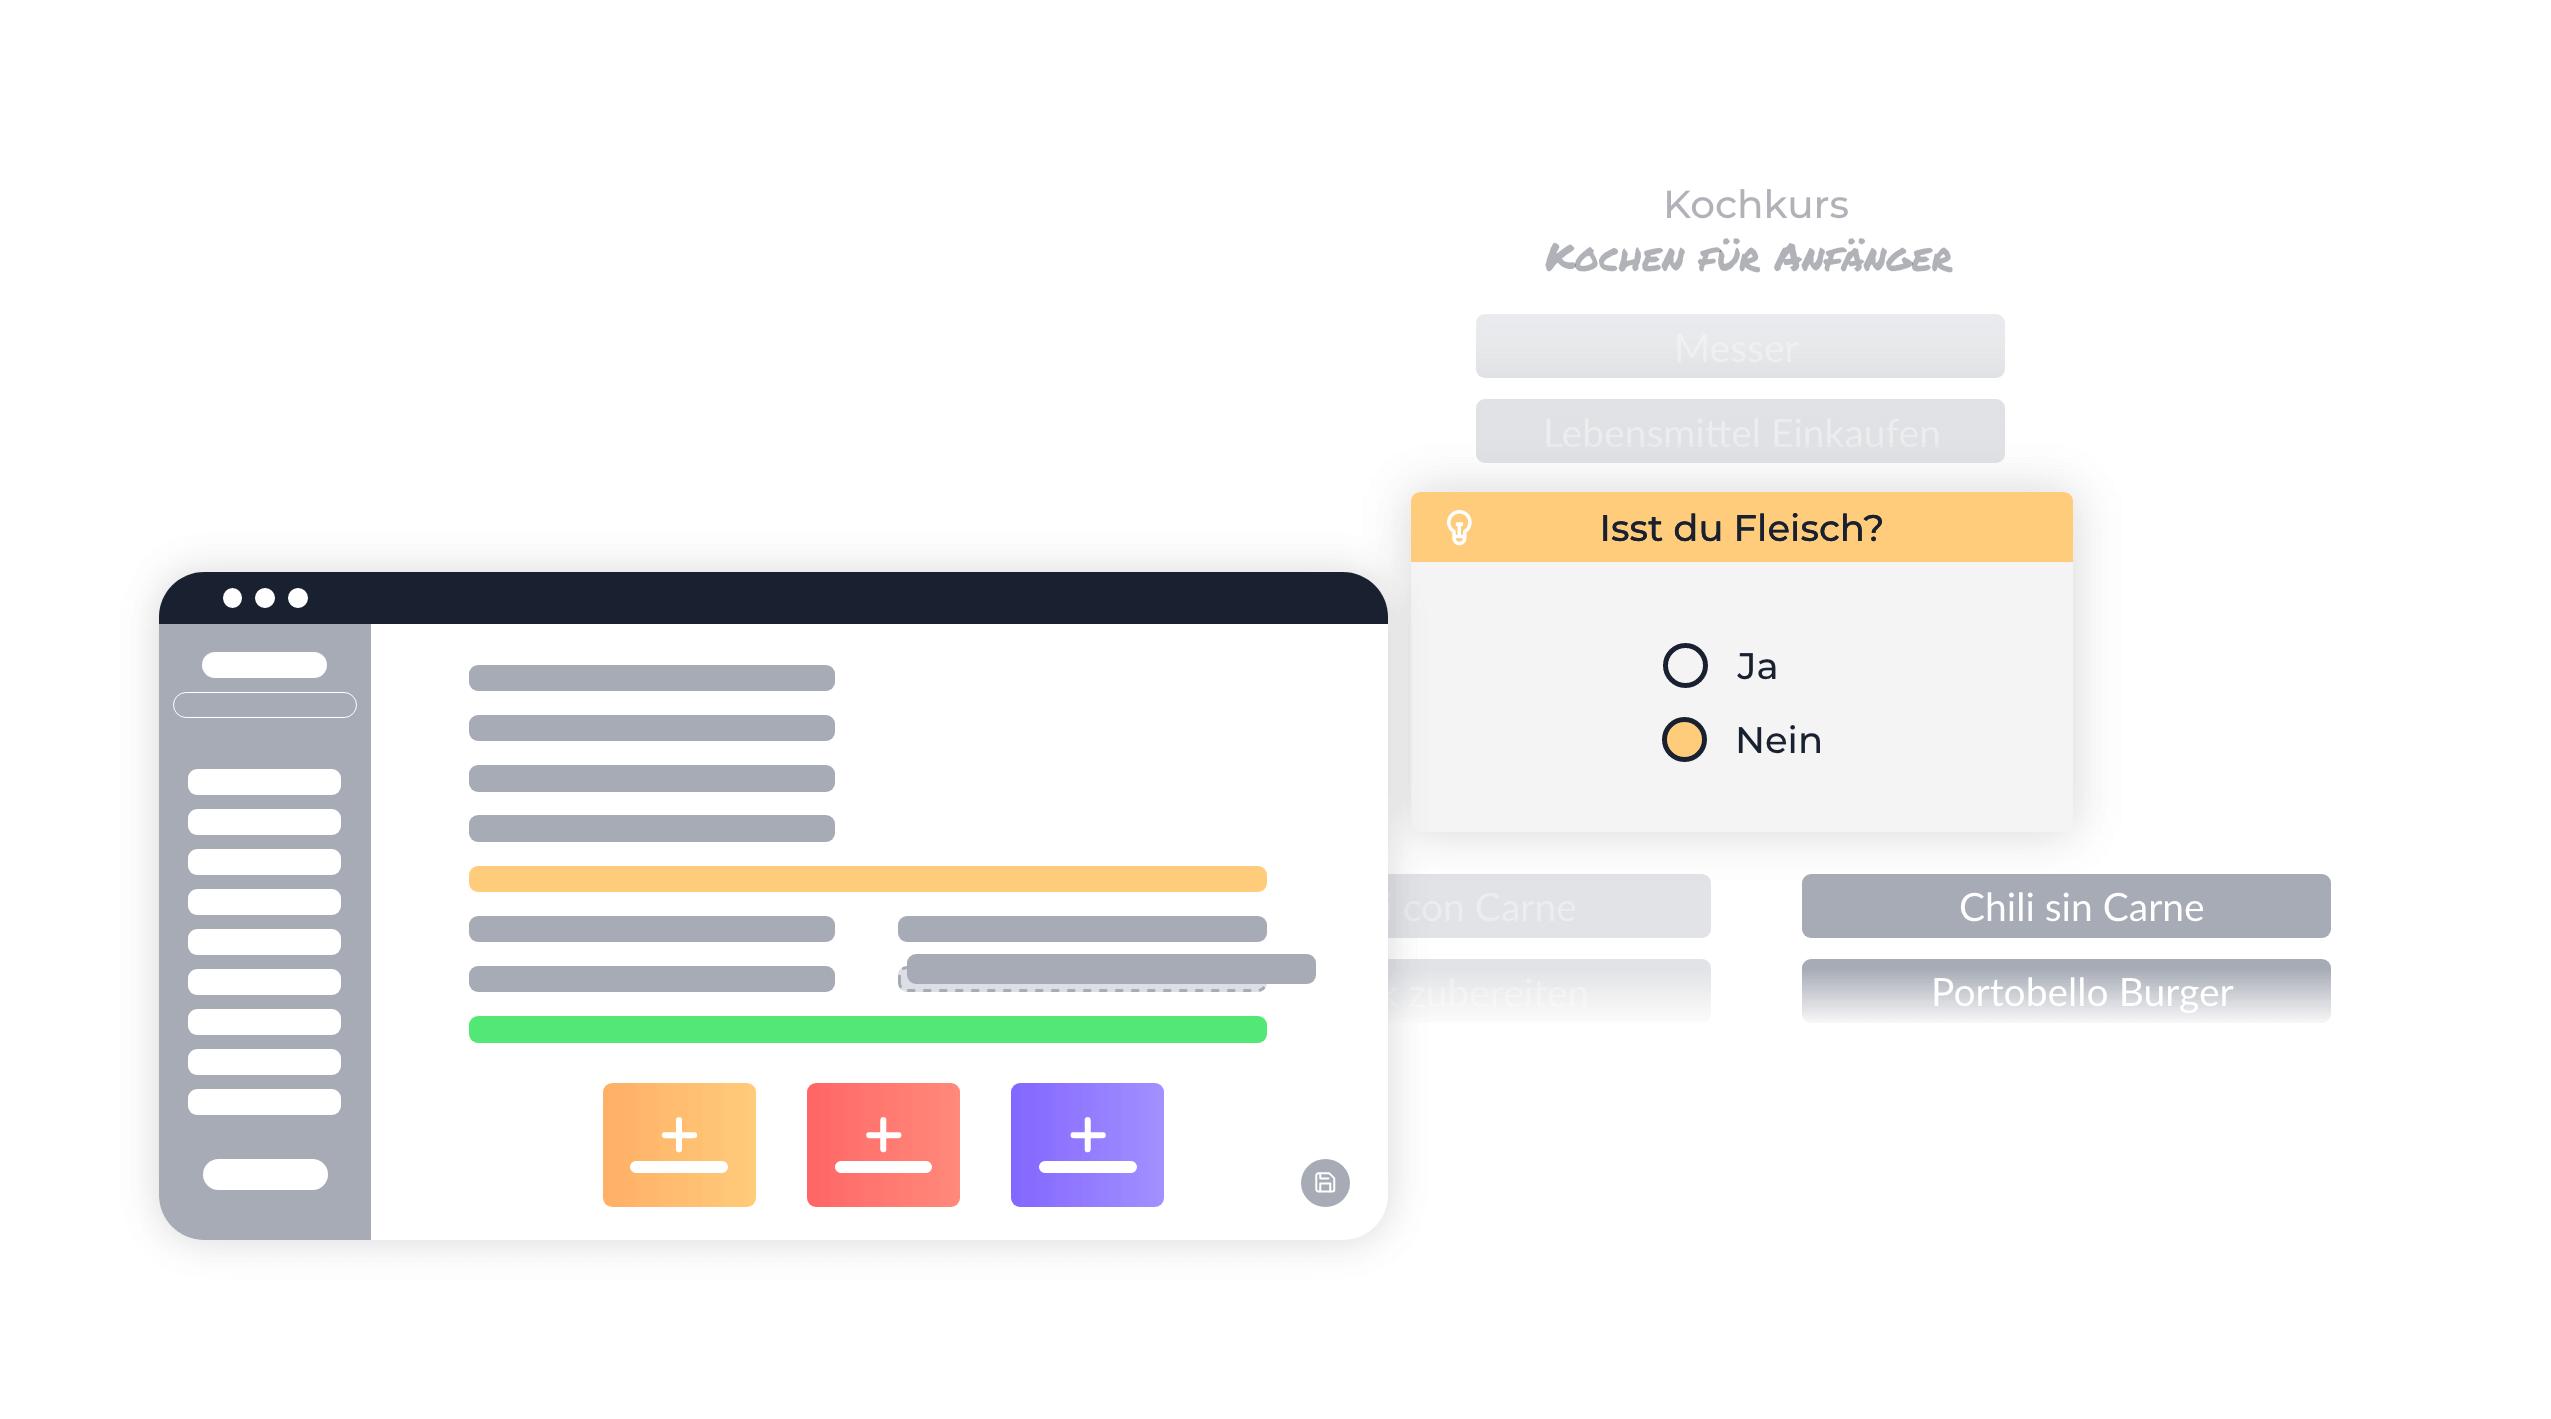 Lernpfade minimalisiert dargestellt